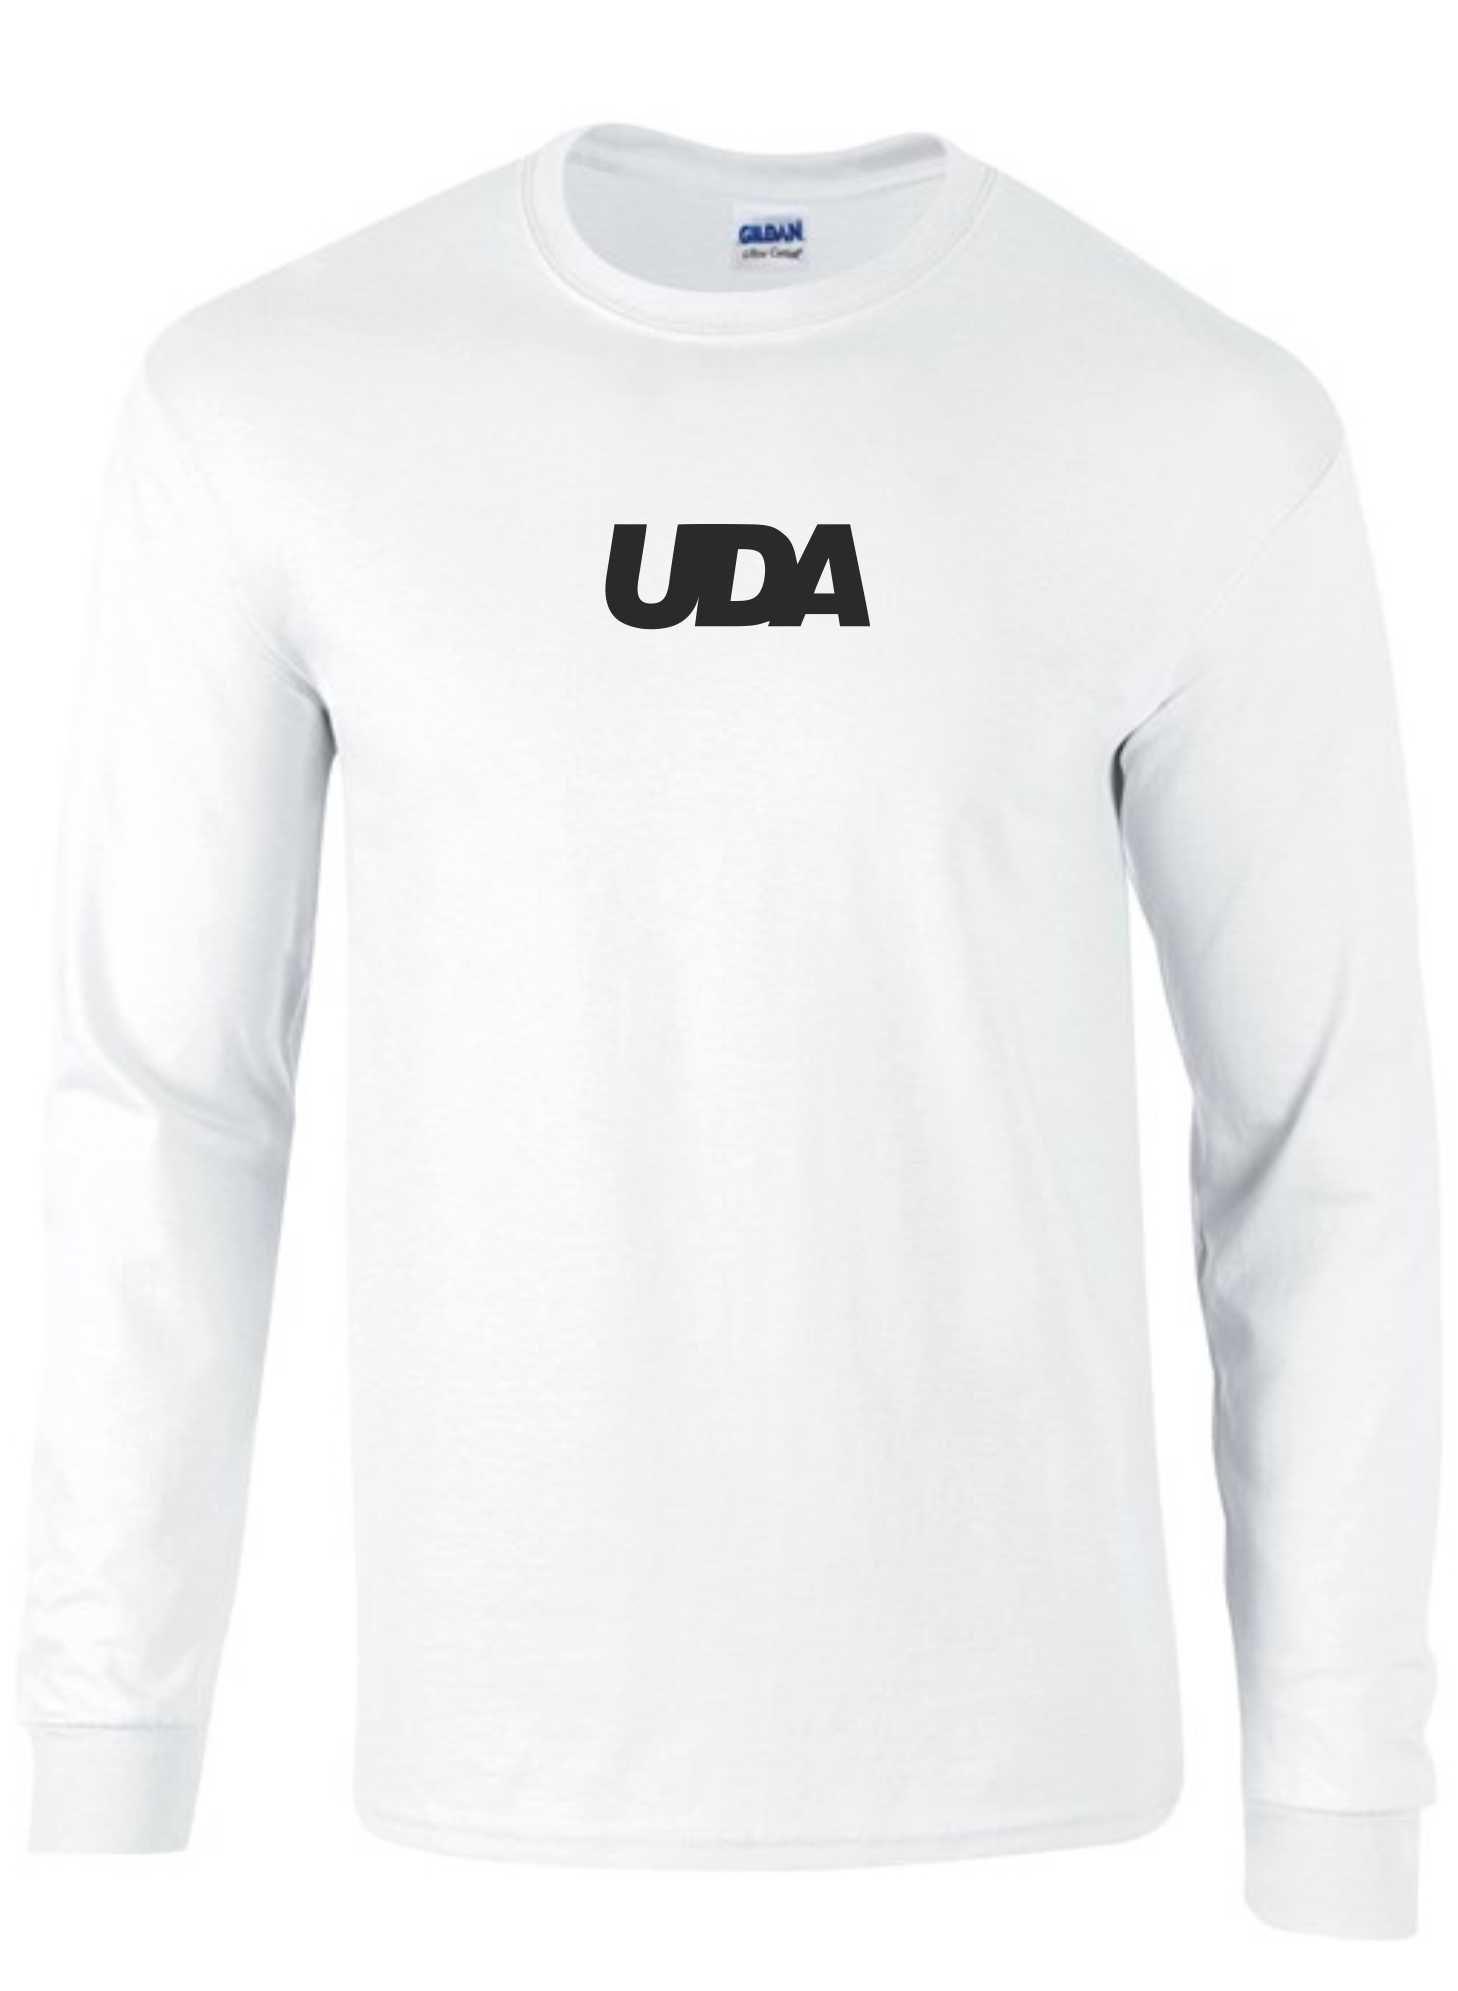 LIMITED EDITION: UDA – Kids T-Shirt L/S (White & Black)